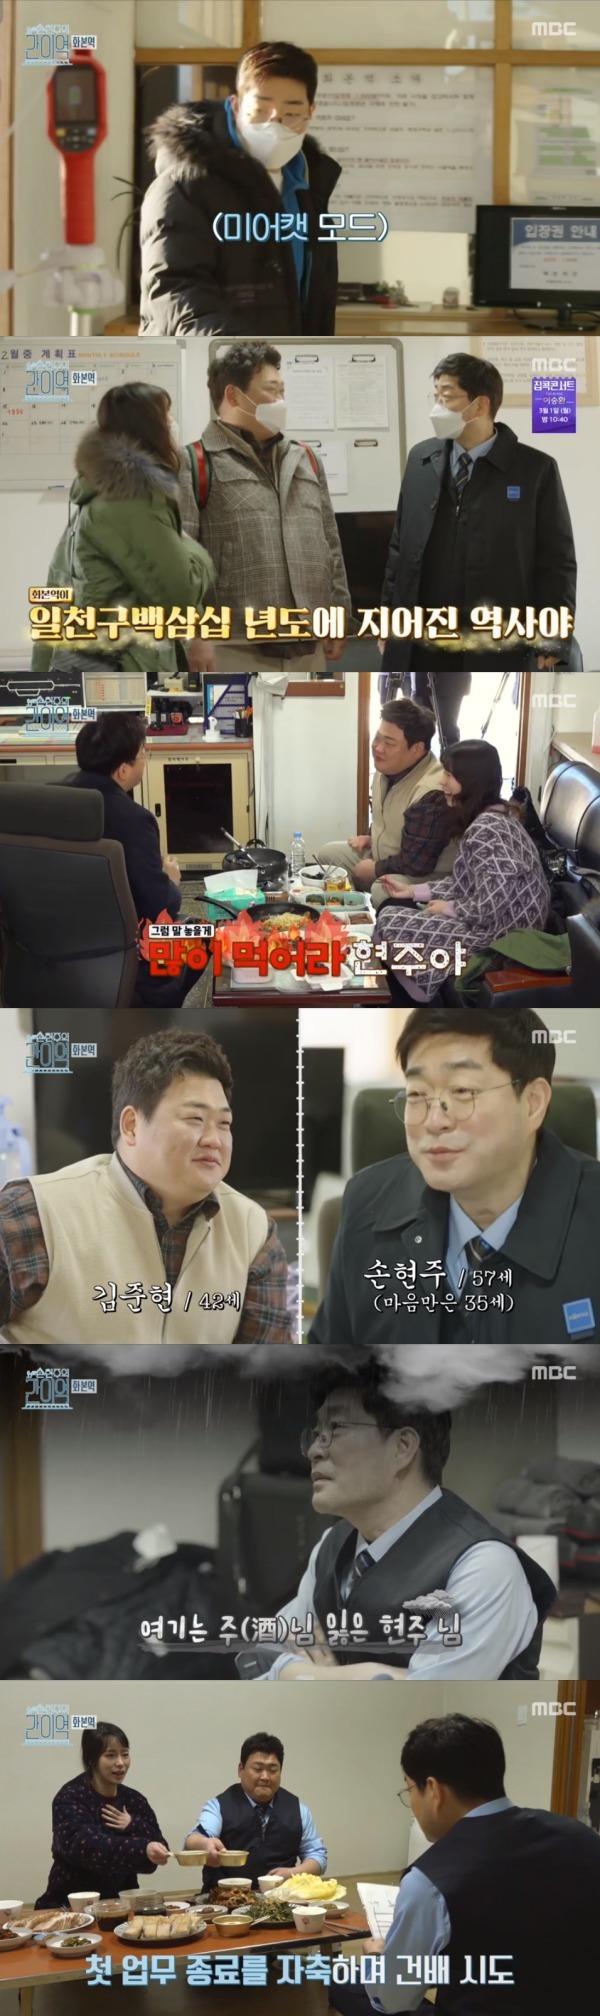 MBC '손현주의 간이역' 방송 화면 캡처 © 뉴스1